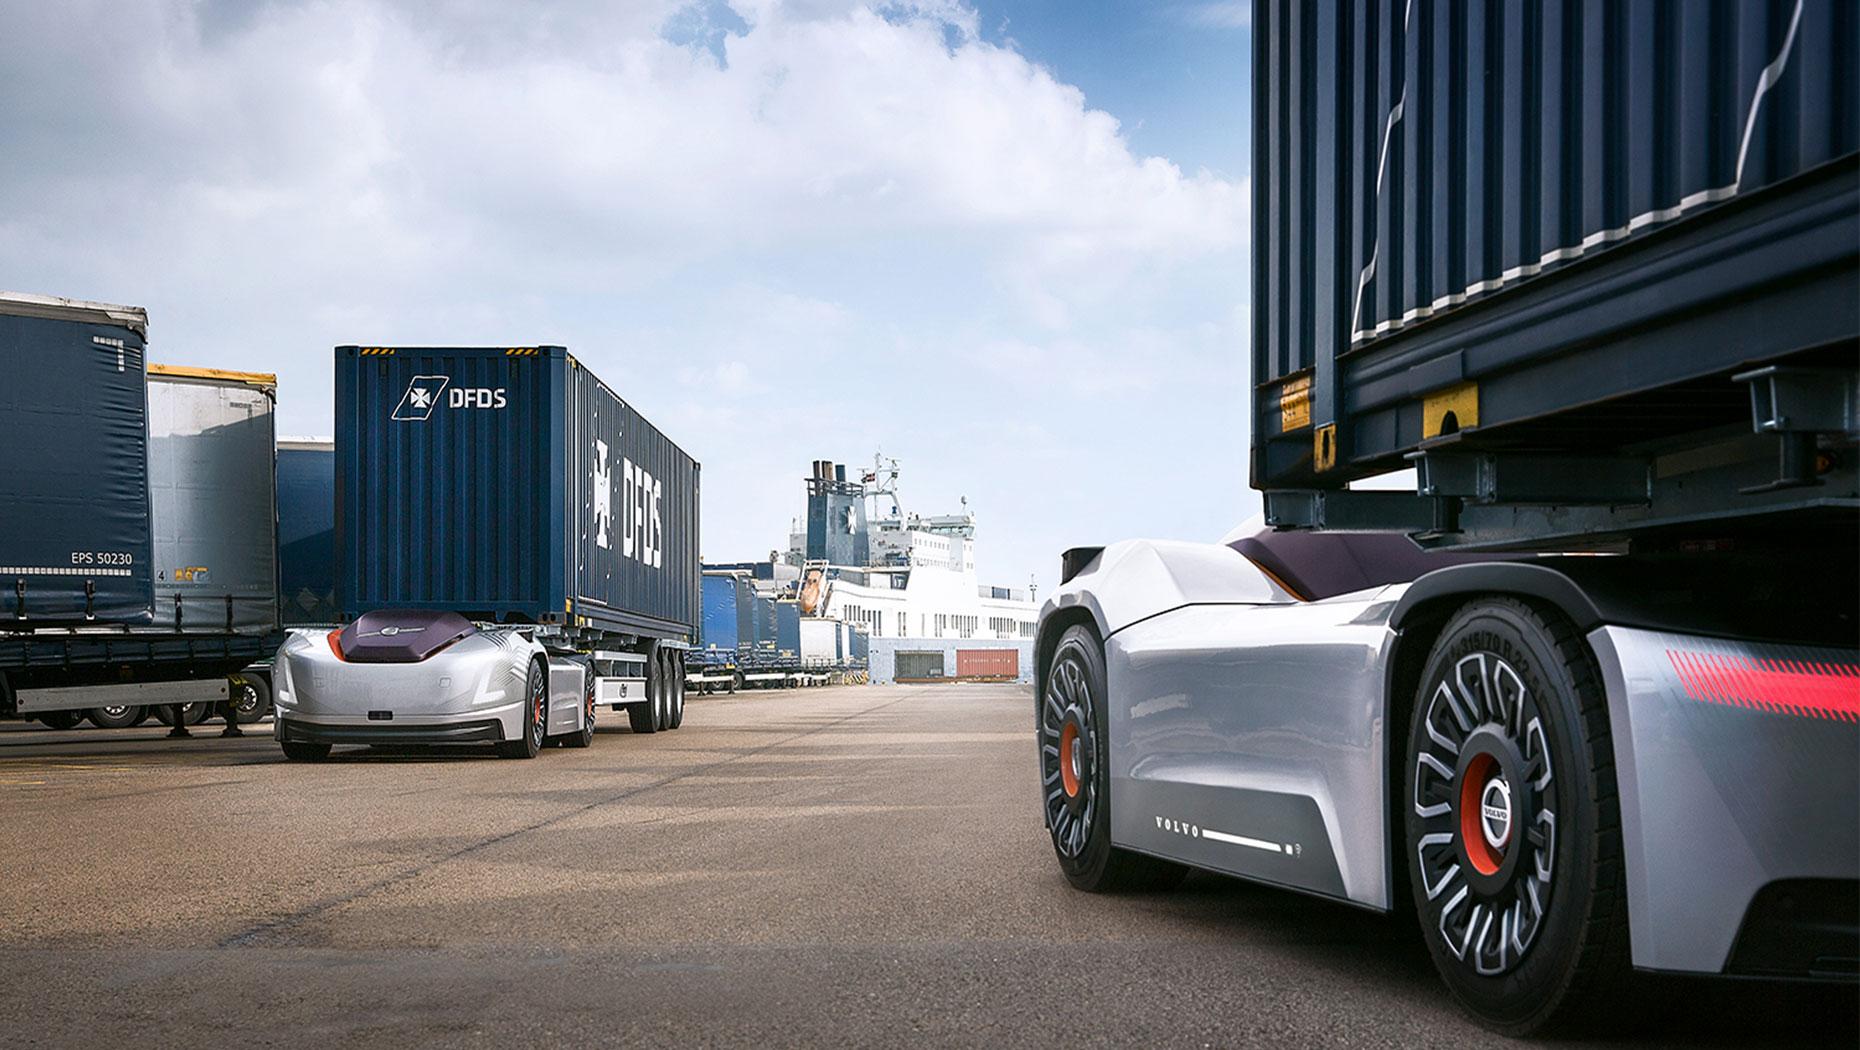 Autonom transport mellom et logistikksenter og en havn